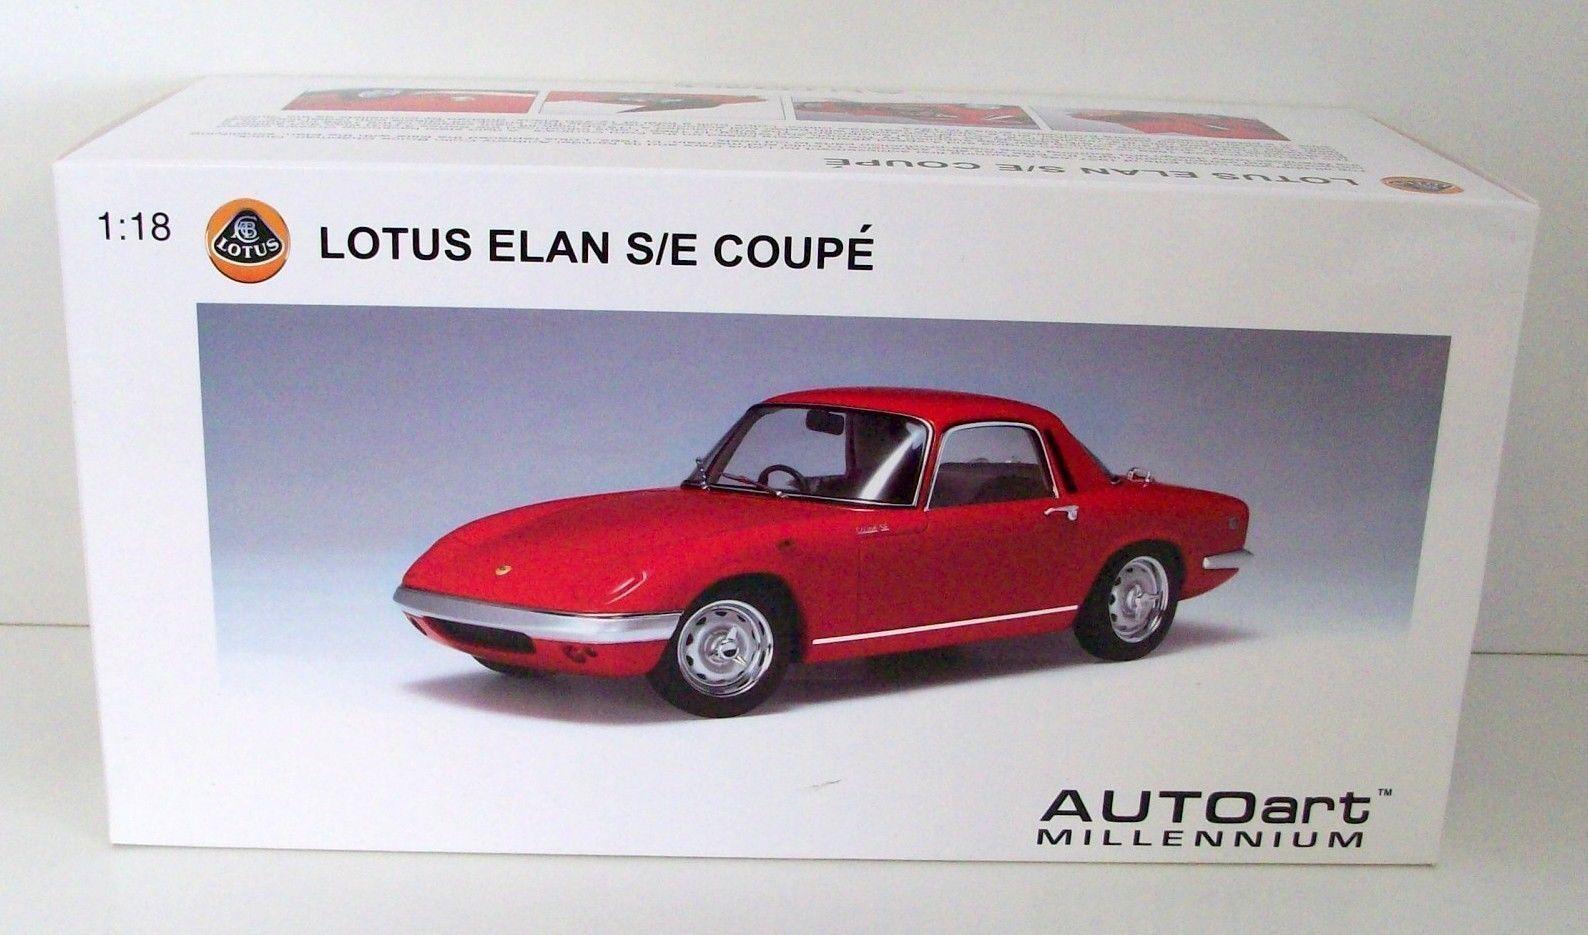 Autoart - Loto Elan S/E Coupé Rojo - Nuevo en Emb. Orig.